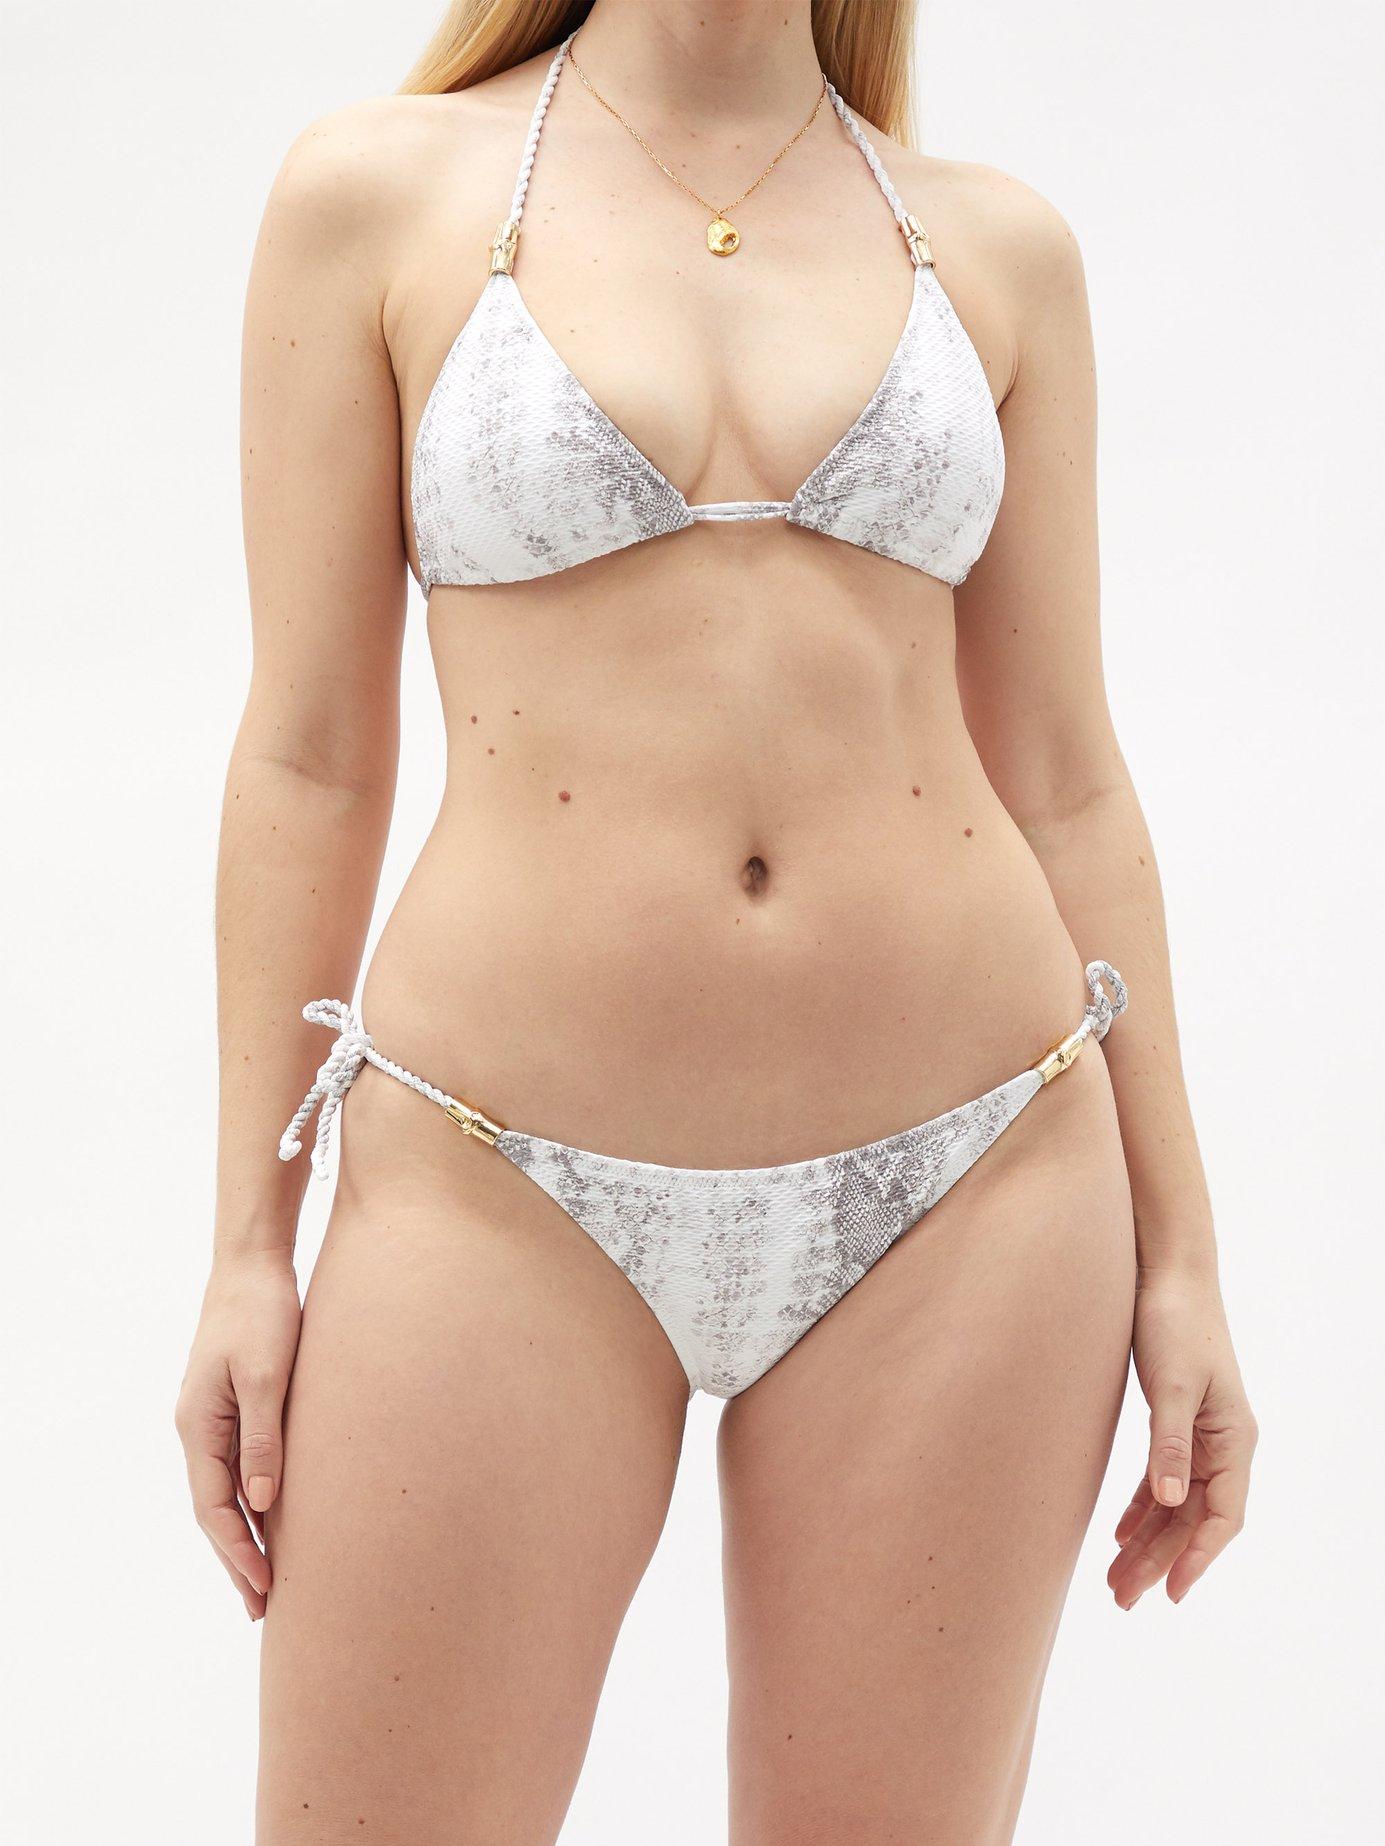 Core tie-side bikini briefs by Heidi Klein